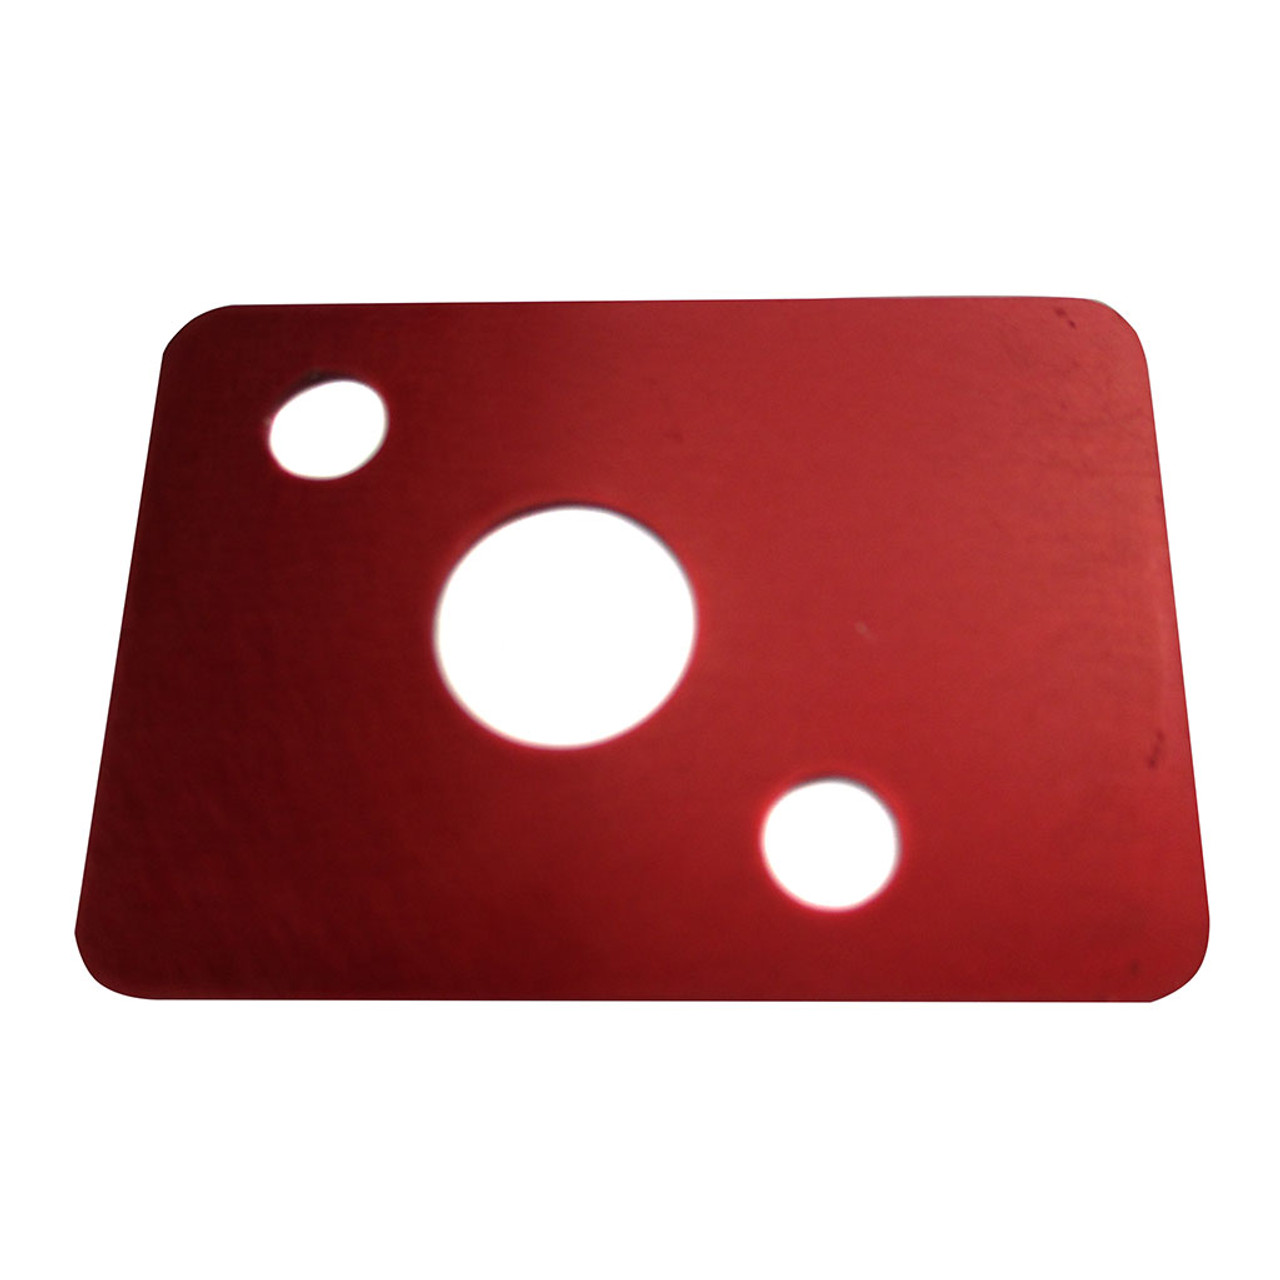 IKF Briggs Flat Head Red Restrictor Plate